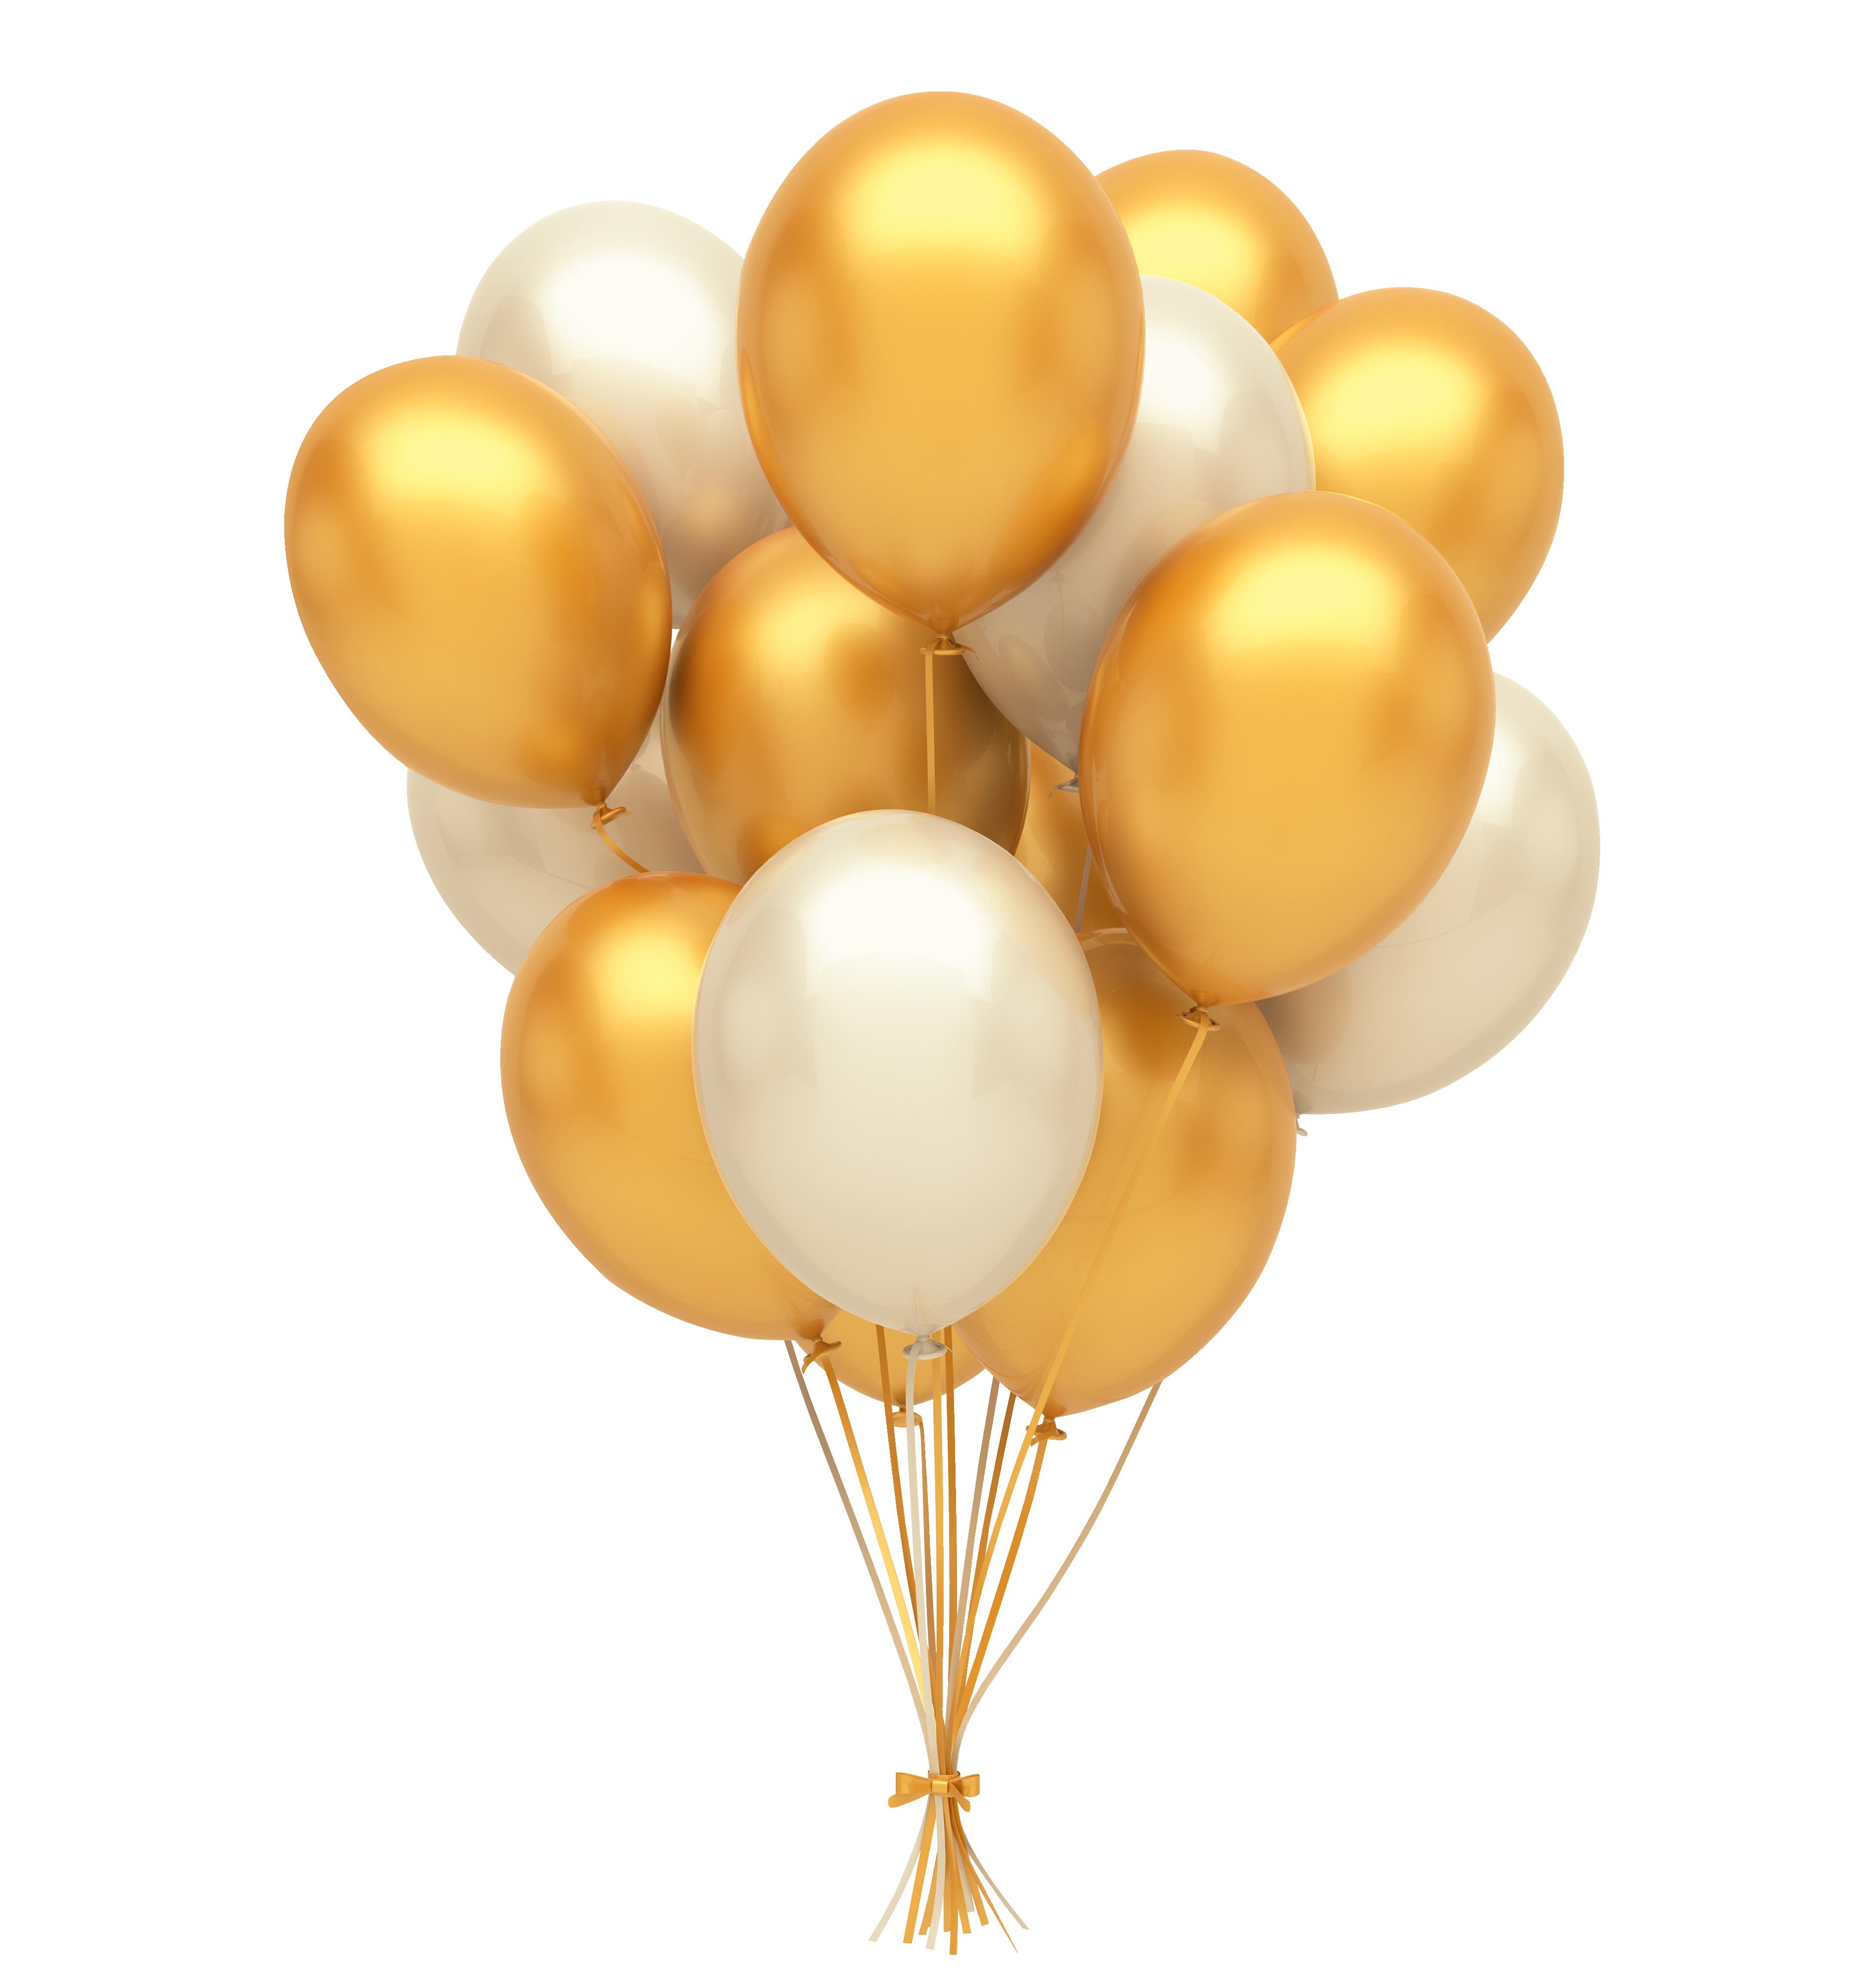 Golden And White Balloons Png Silver Balloon Gold Balloons Balloons